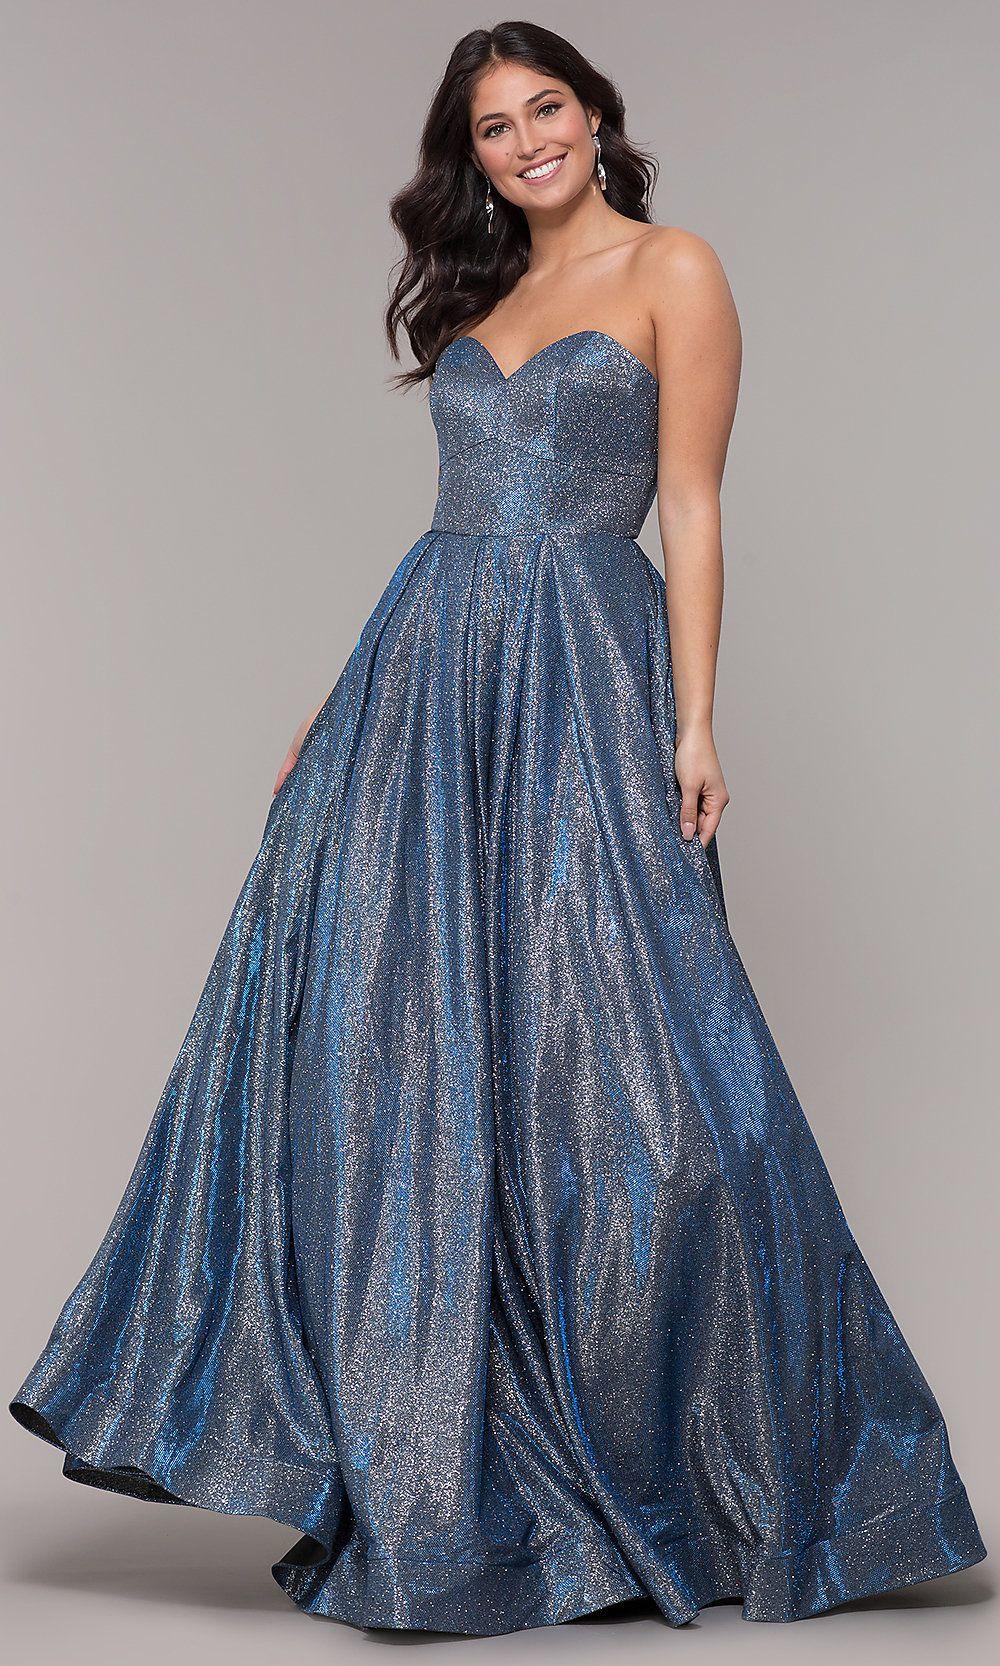 Glitter Jersey Long Strapless Sweetheart Prom Dress Prom Dresses Dresses Sparkly Dress [ 1666 x 1000 Pixel ]